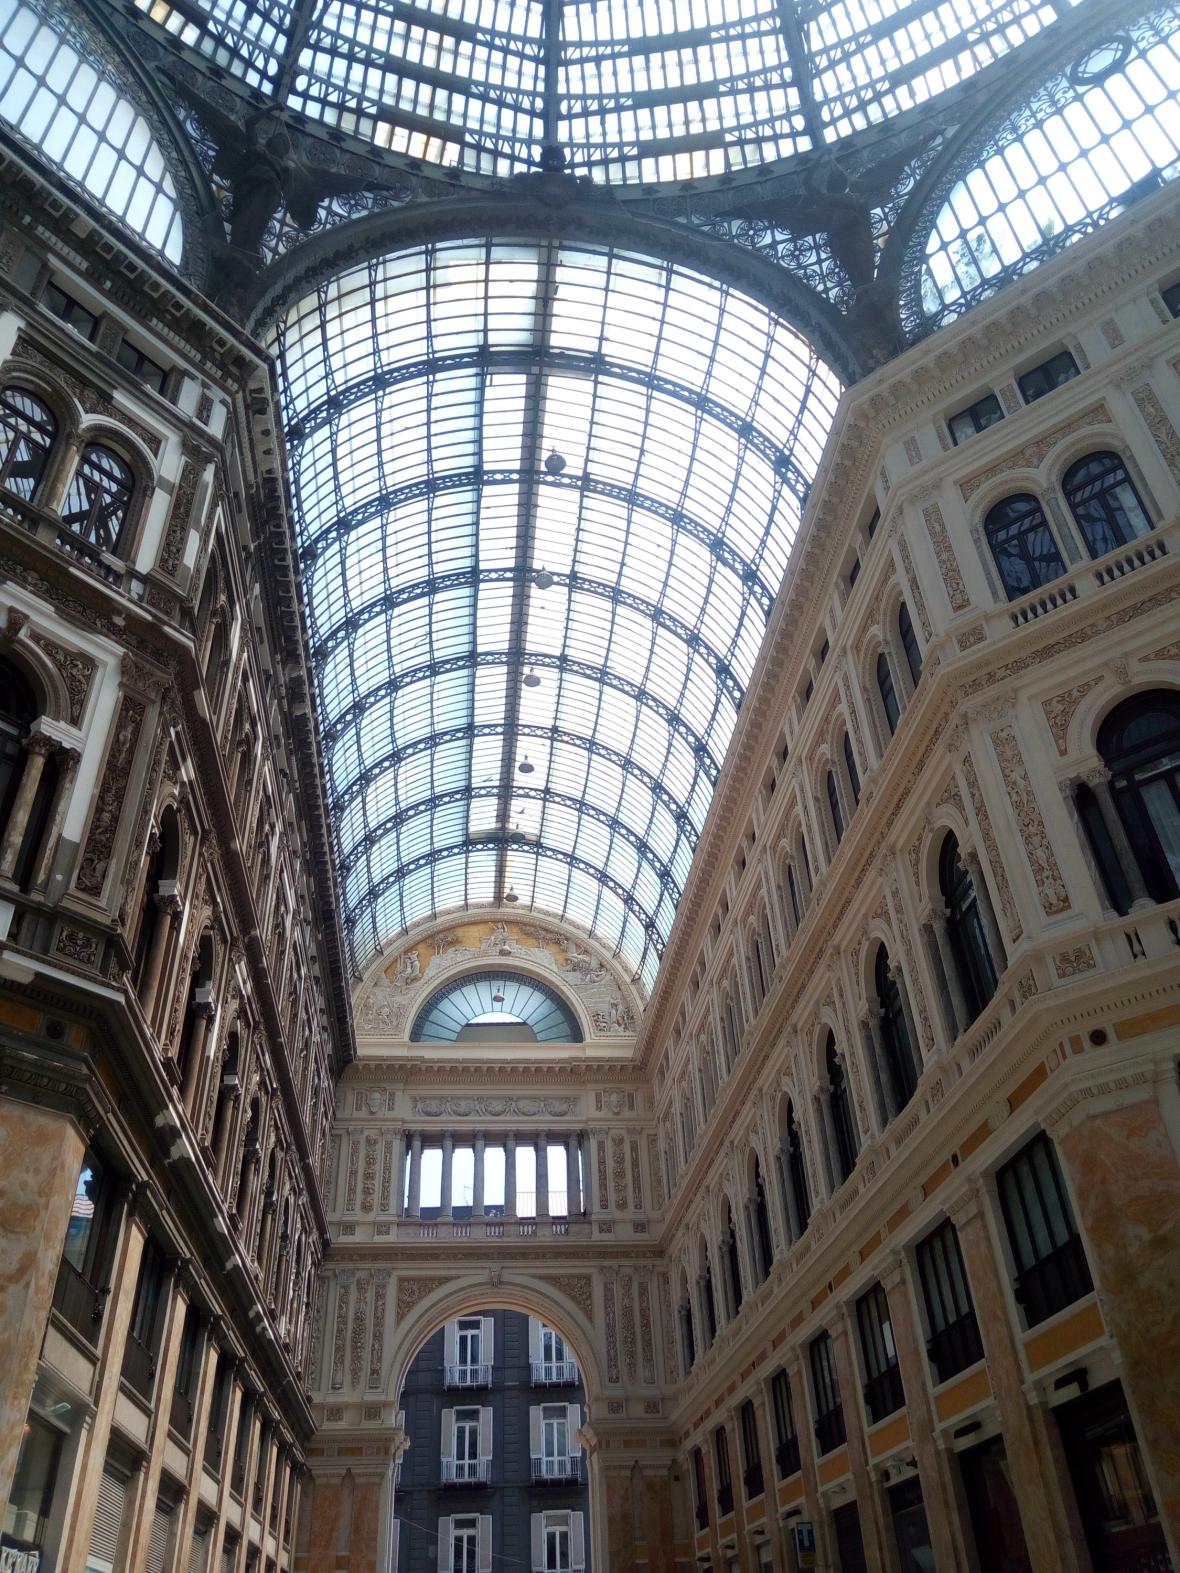 Umberto I Gallery